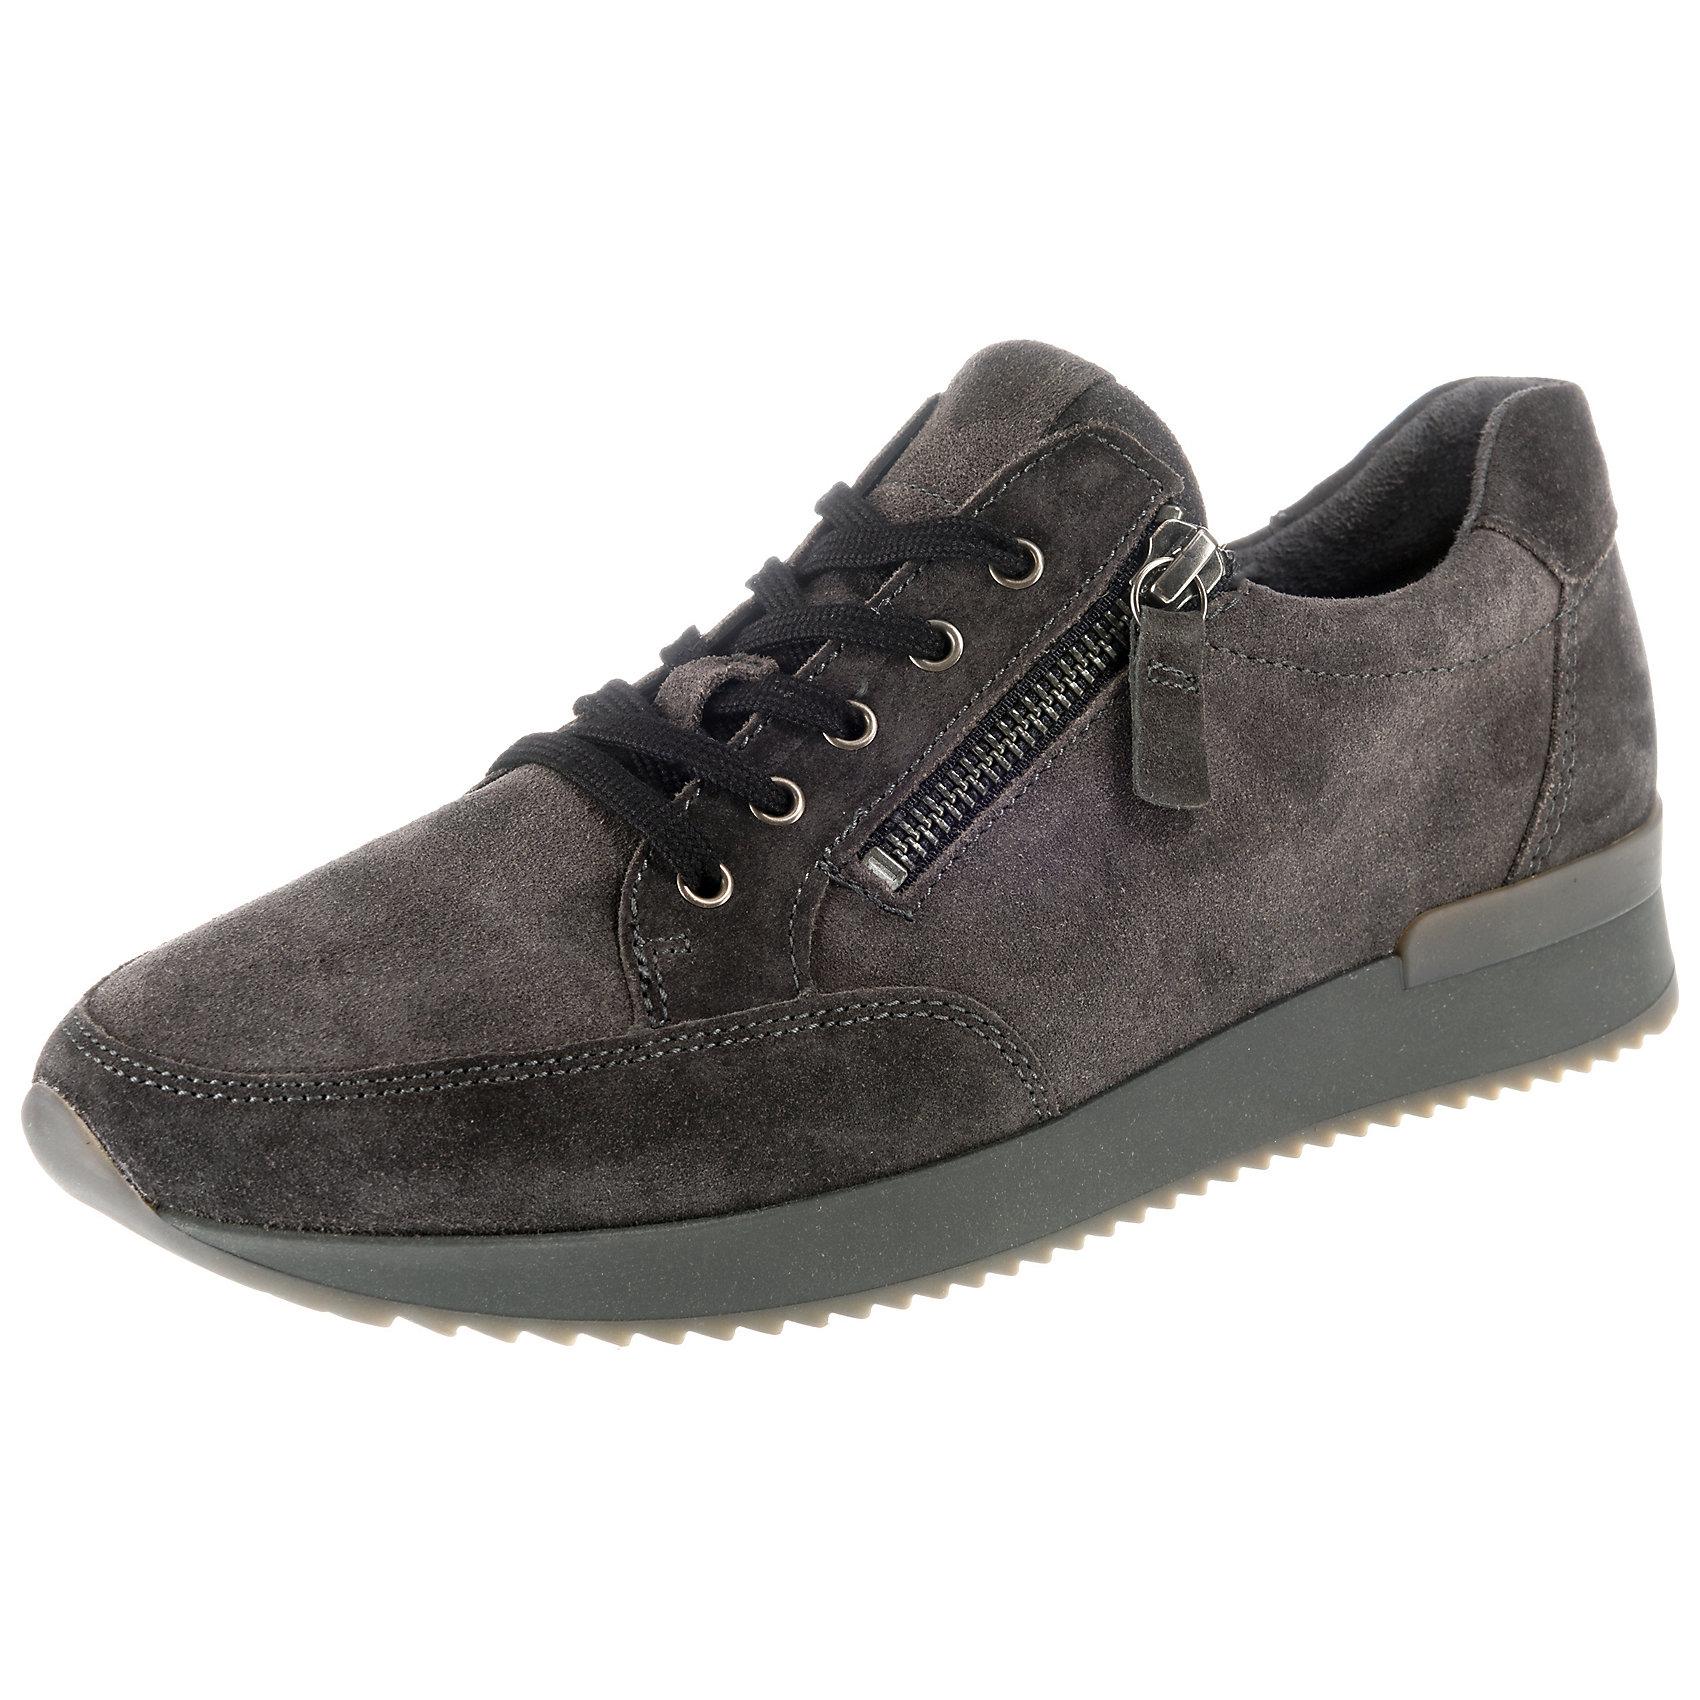 wholesale dealer d056e c5f37 ... Nike Air Presto Triple Triple Triple Black Sz 14 Running 848132-009  Classic Limited Off ...